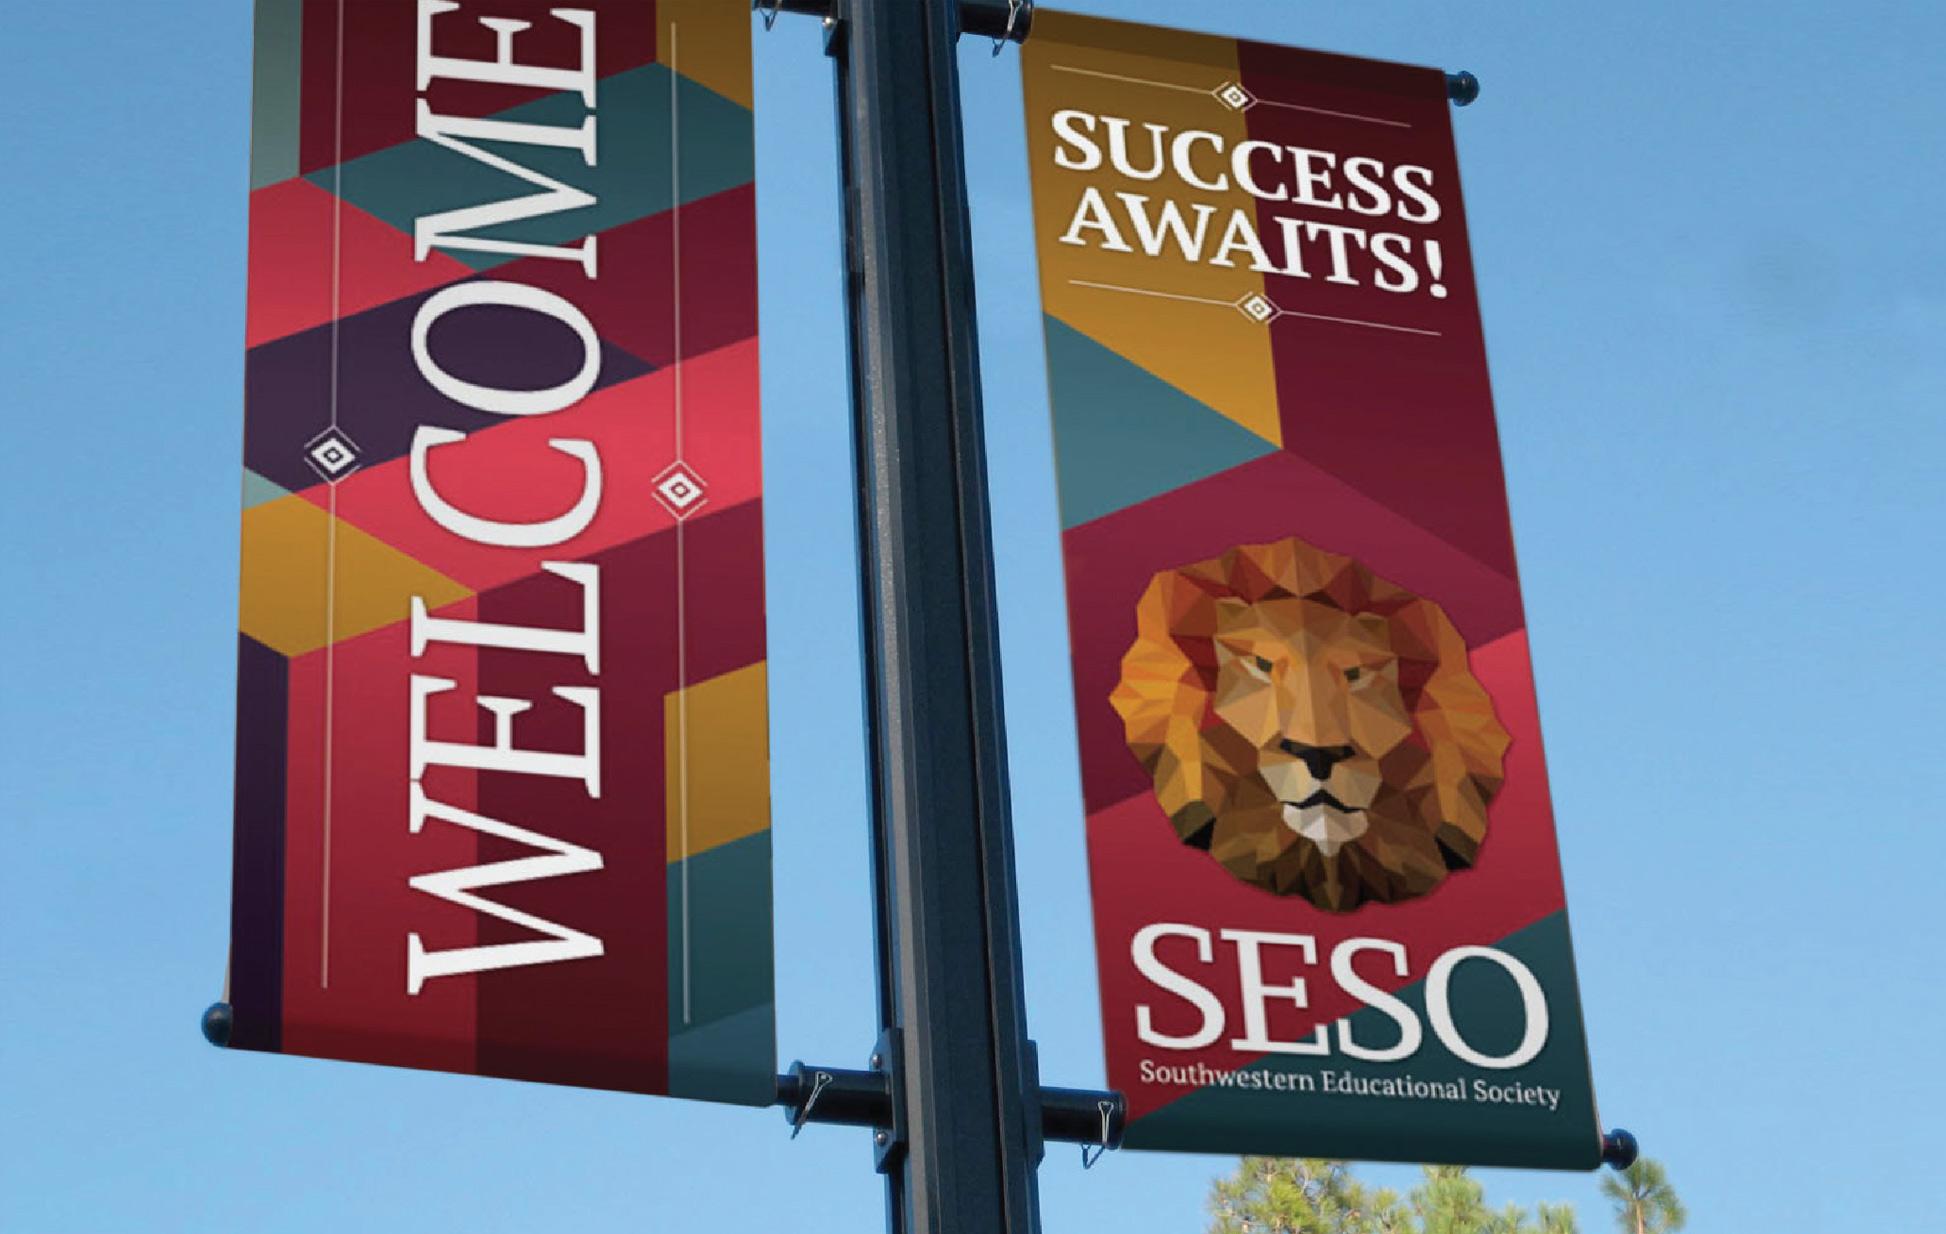 seso - southwestern educational society